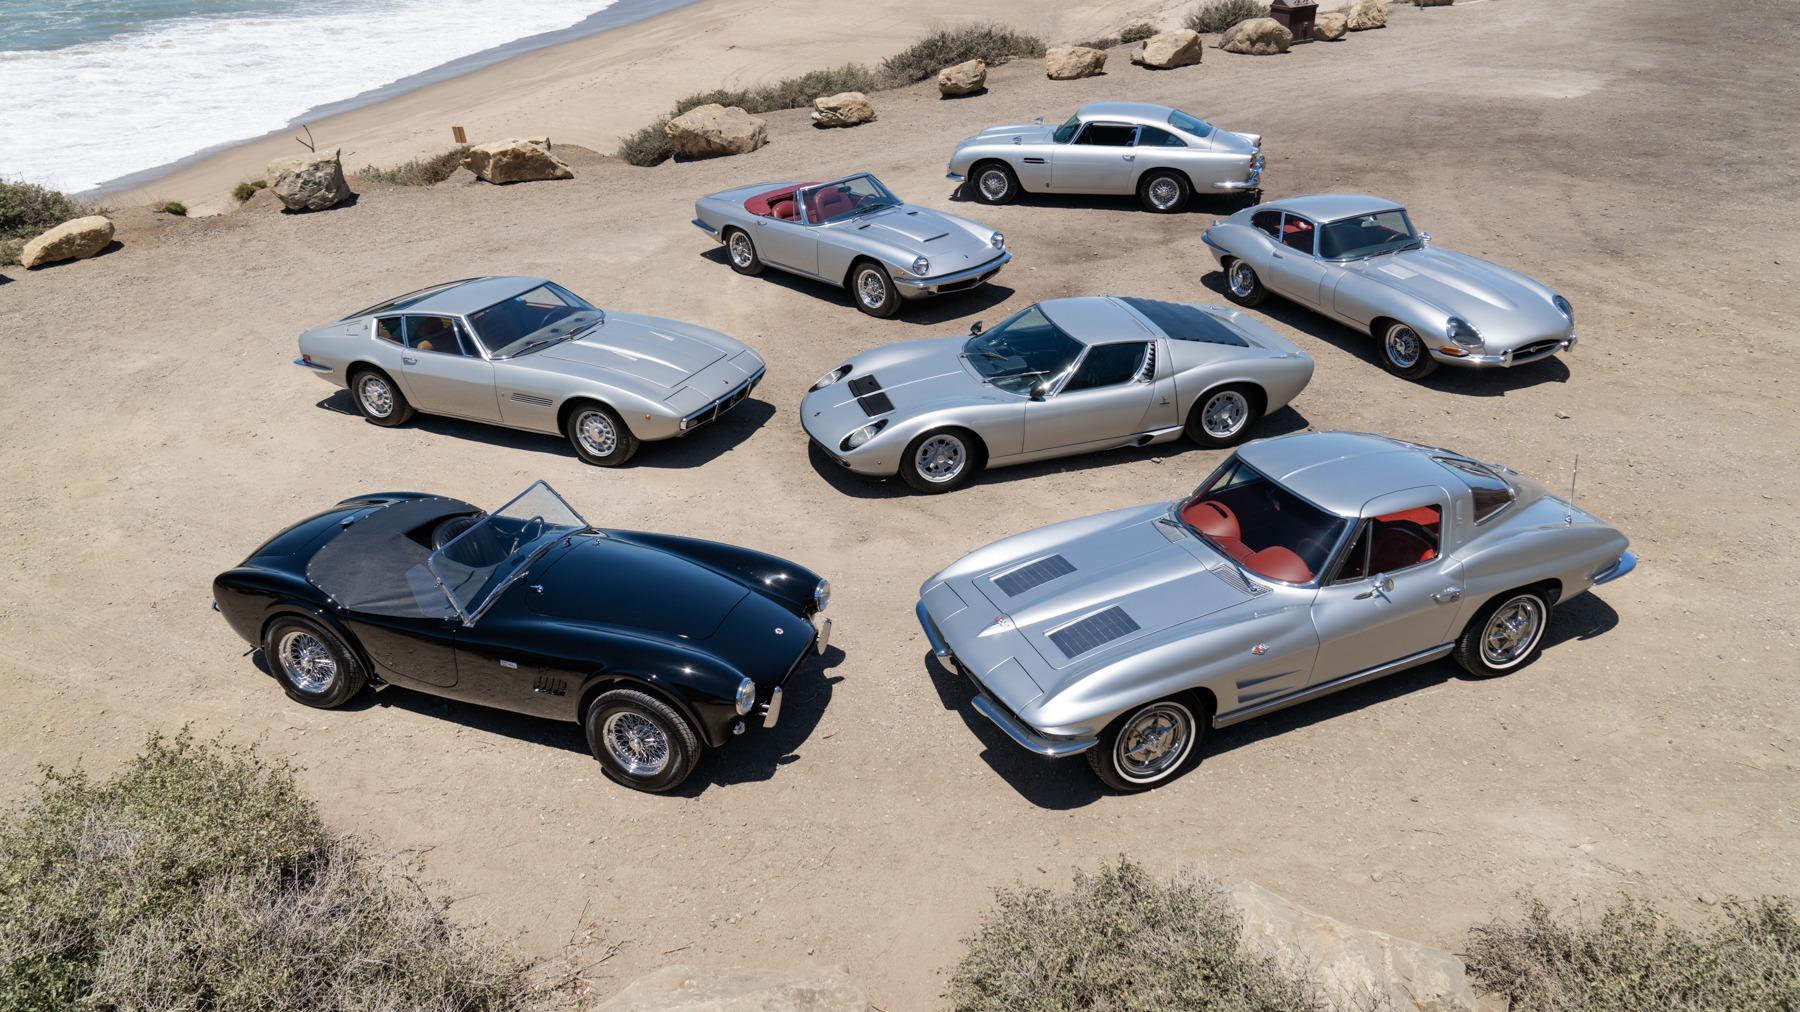 Nå går den legendariske musikerens bilsamling under hammeren